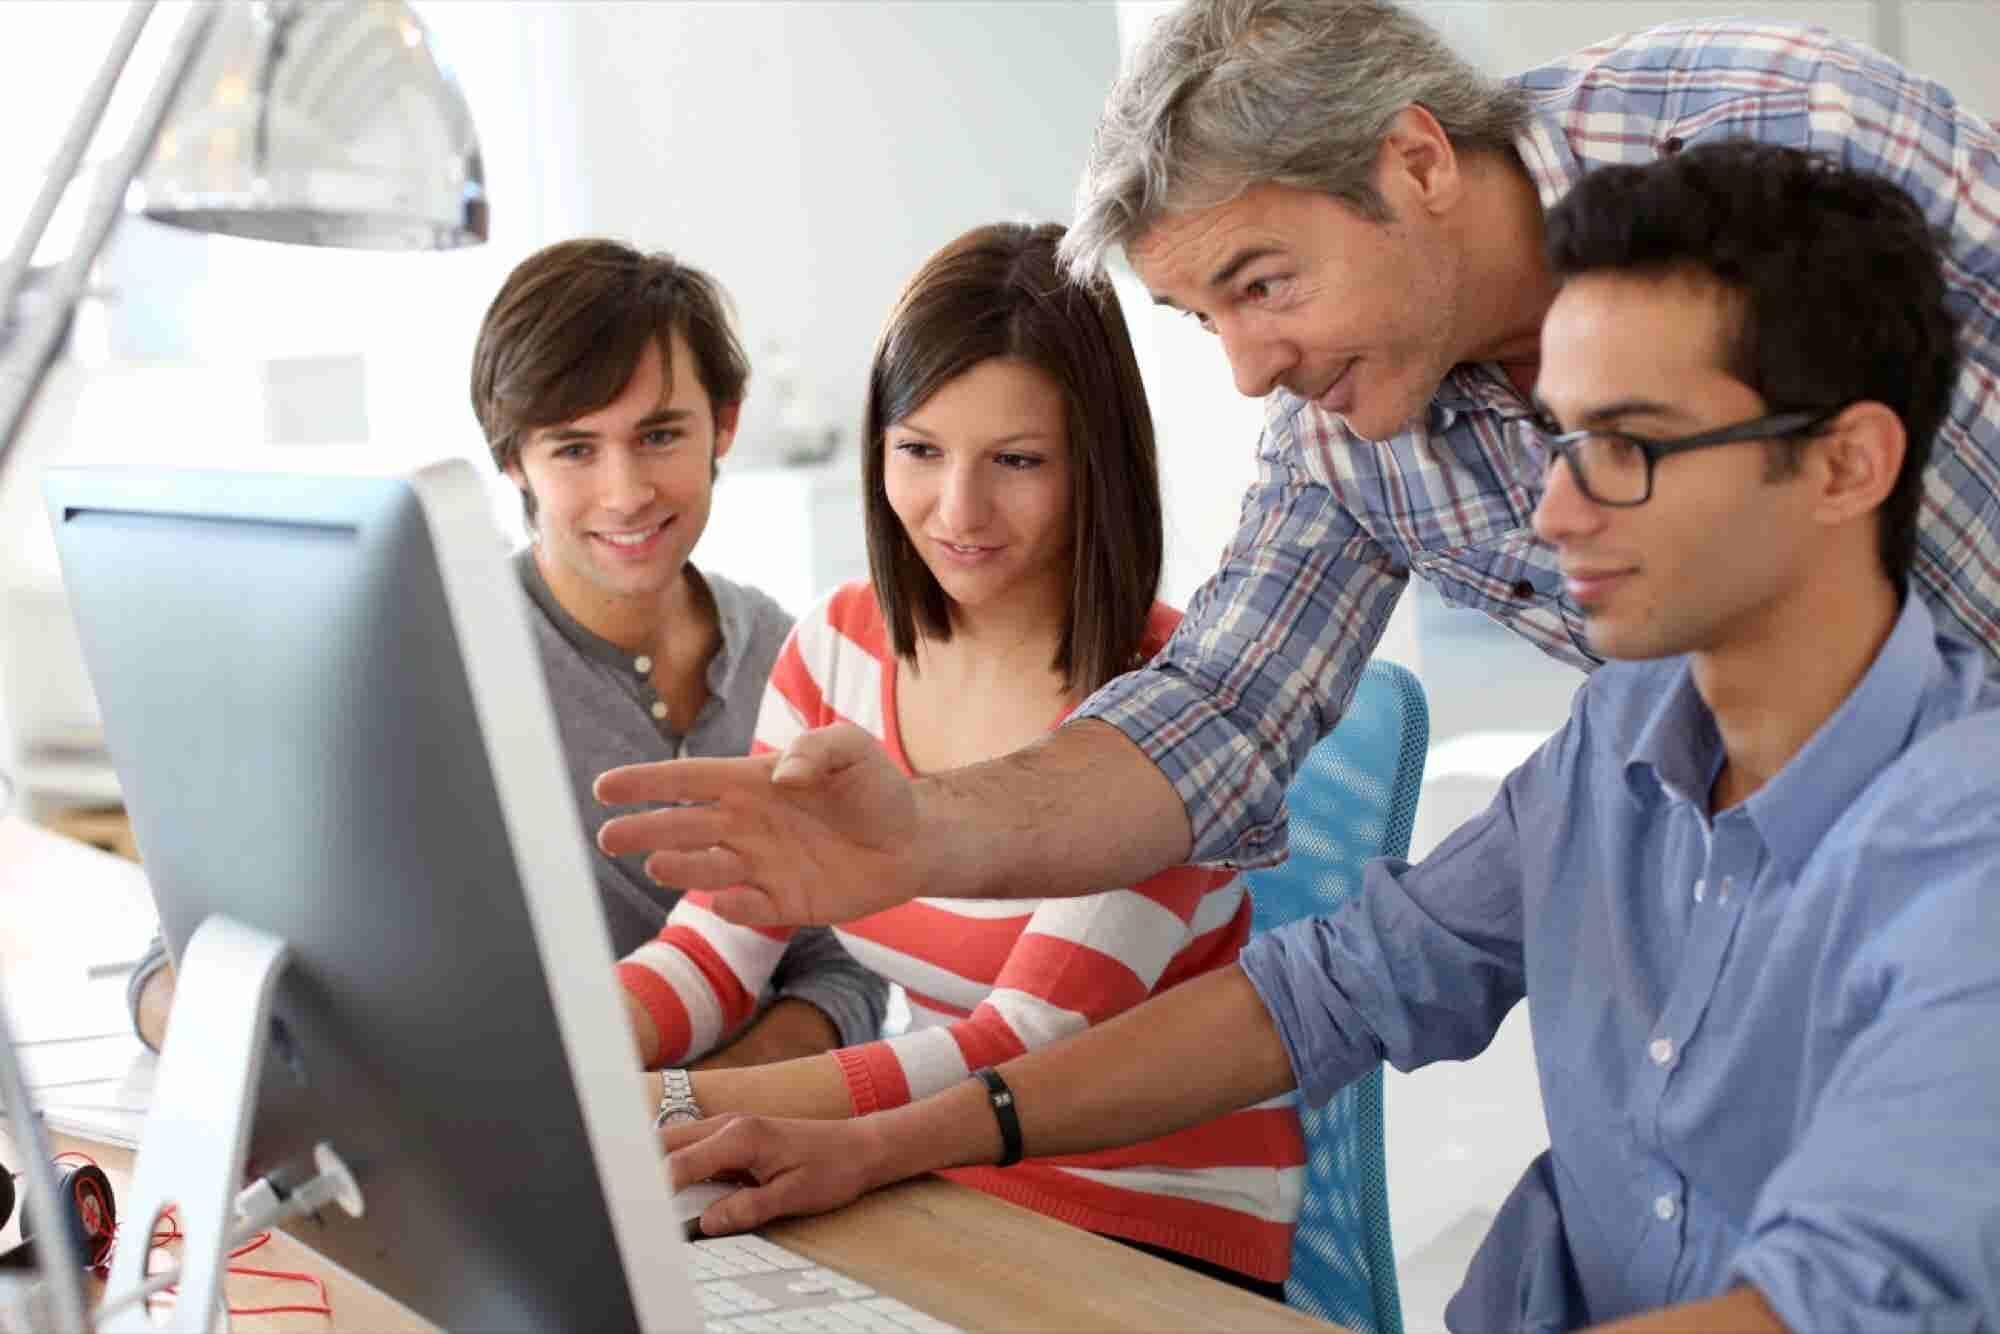 5 Essential Steps to Land an Internship You'll Love